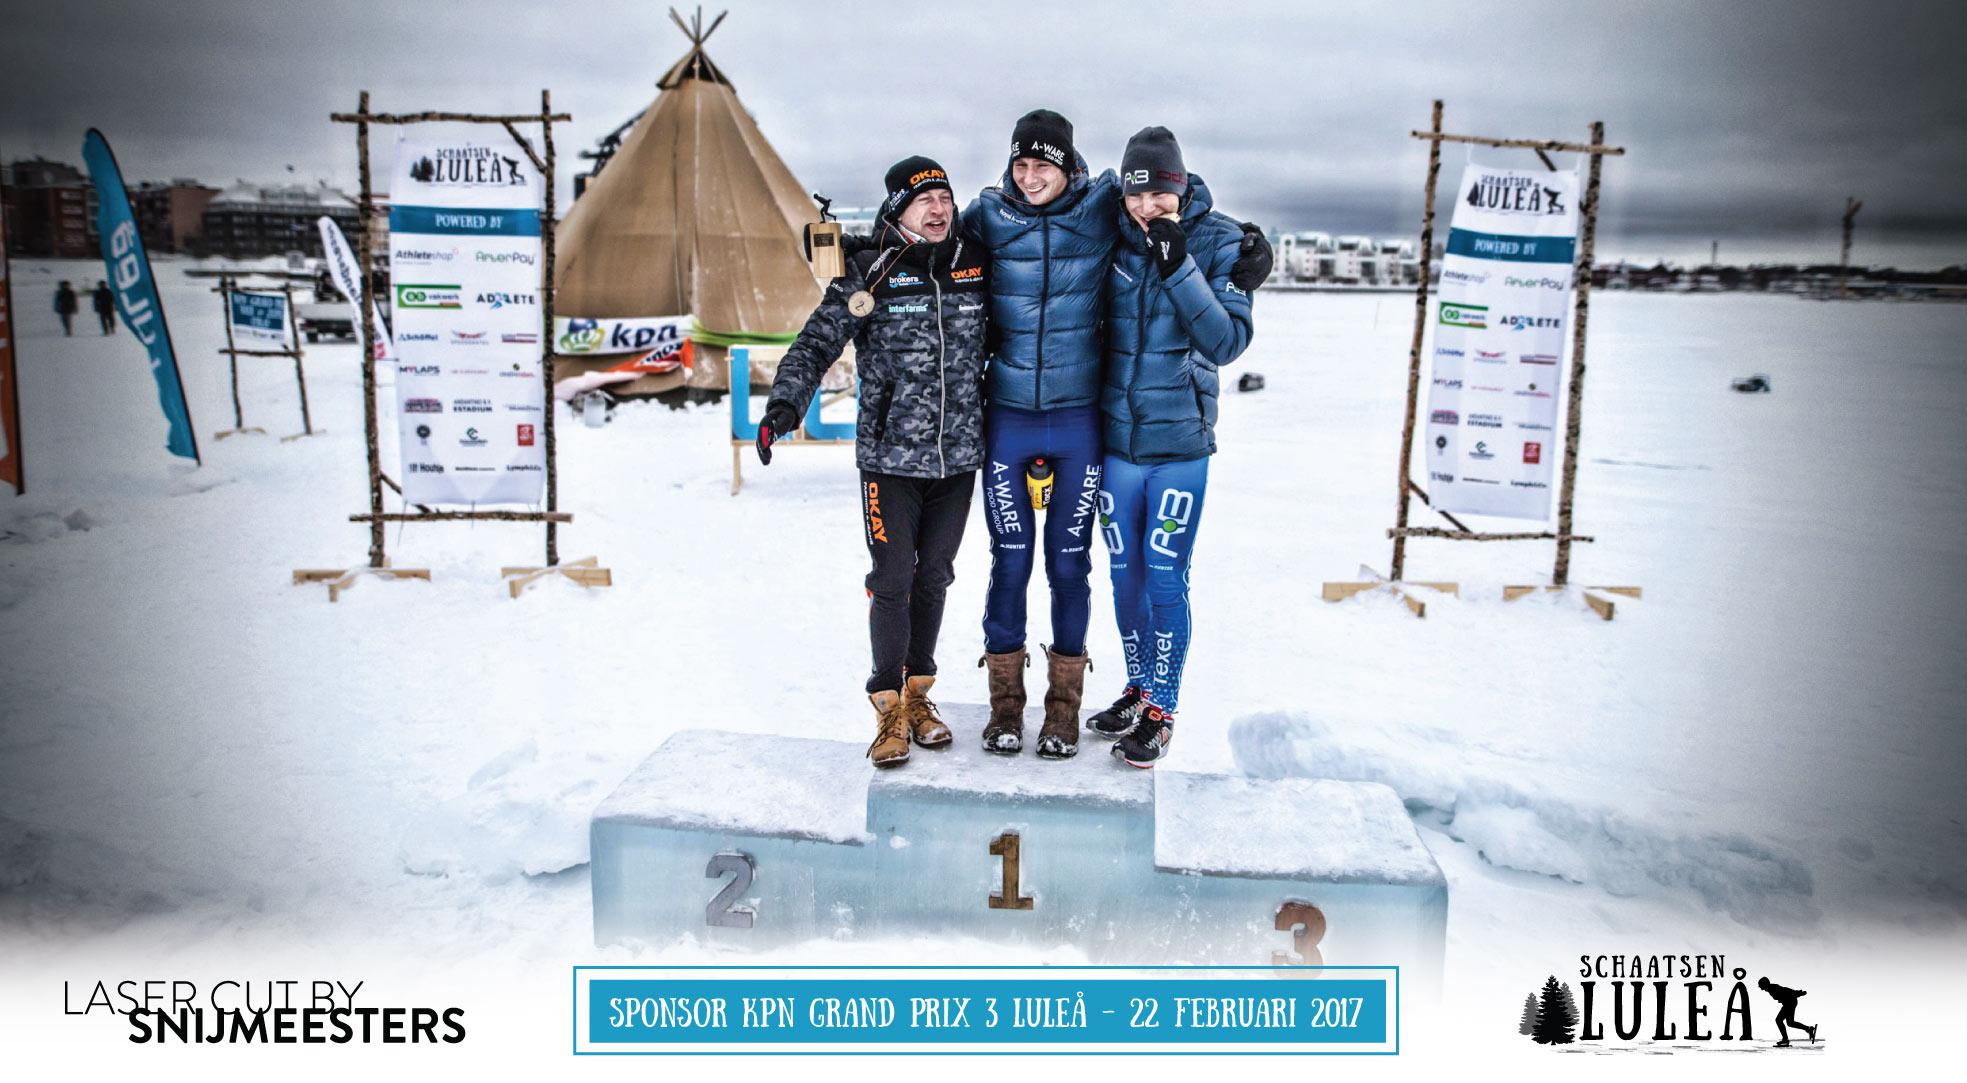 Lulea-snijmeesters-medaille-houten-laser-schouten-vreugdenhil-mesu-podium